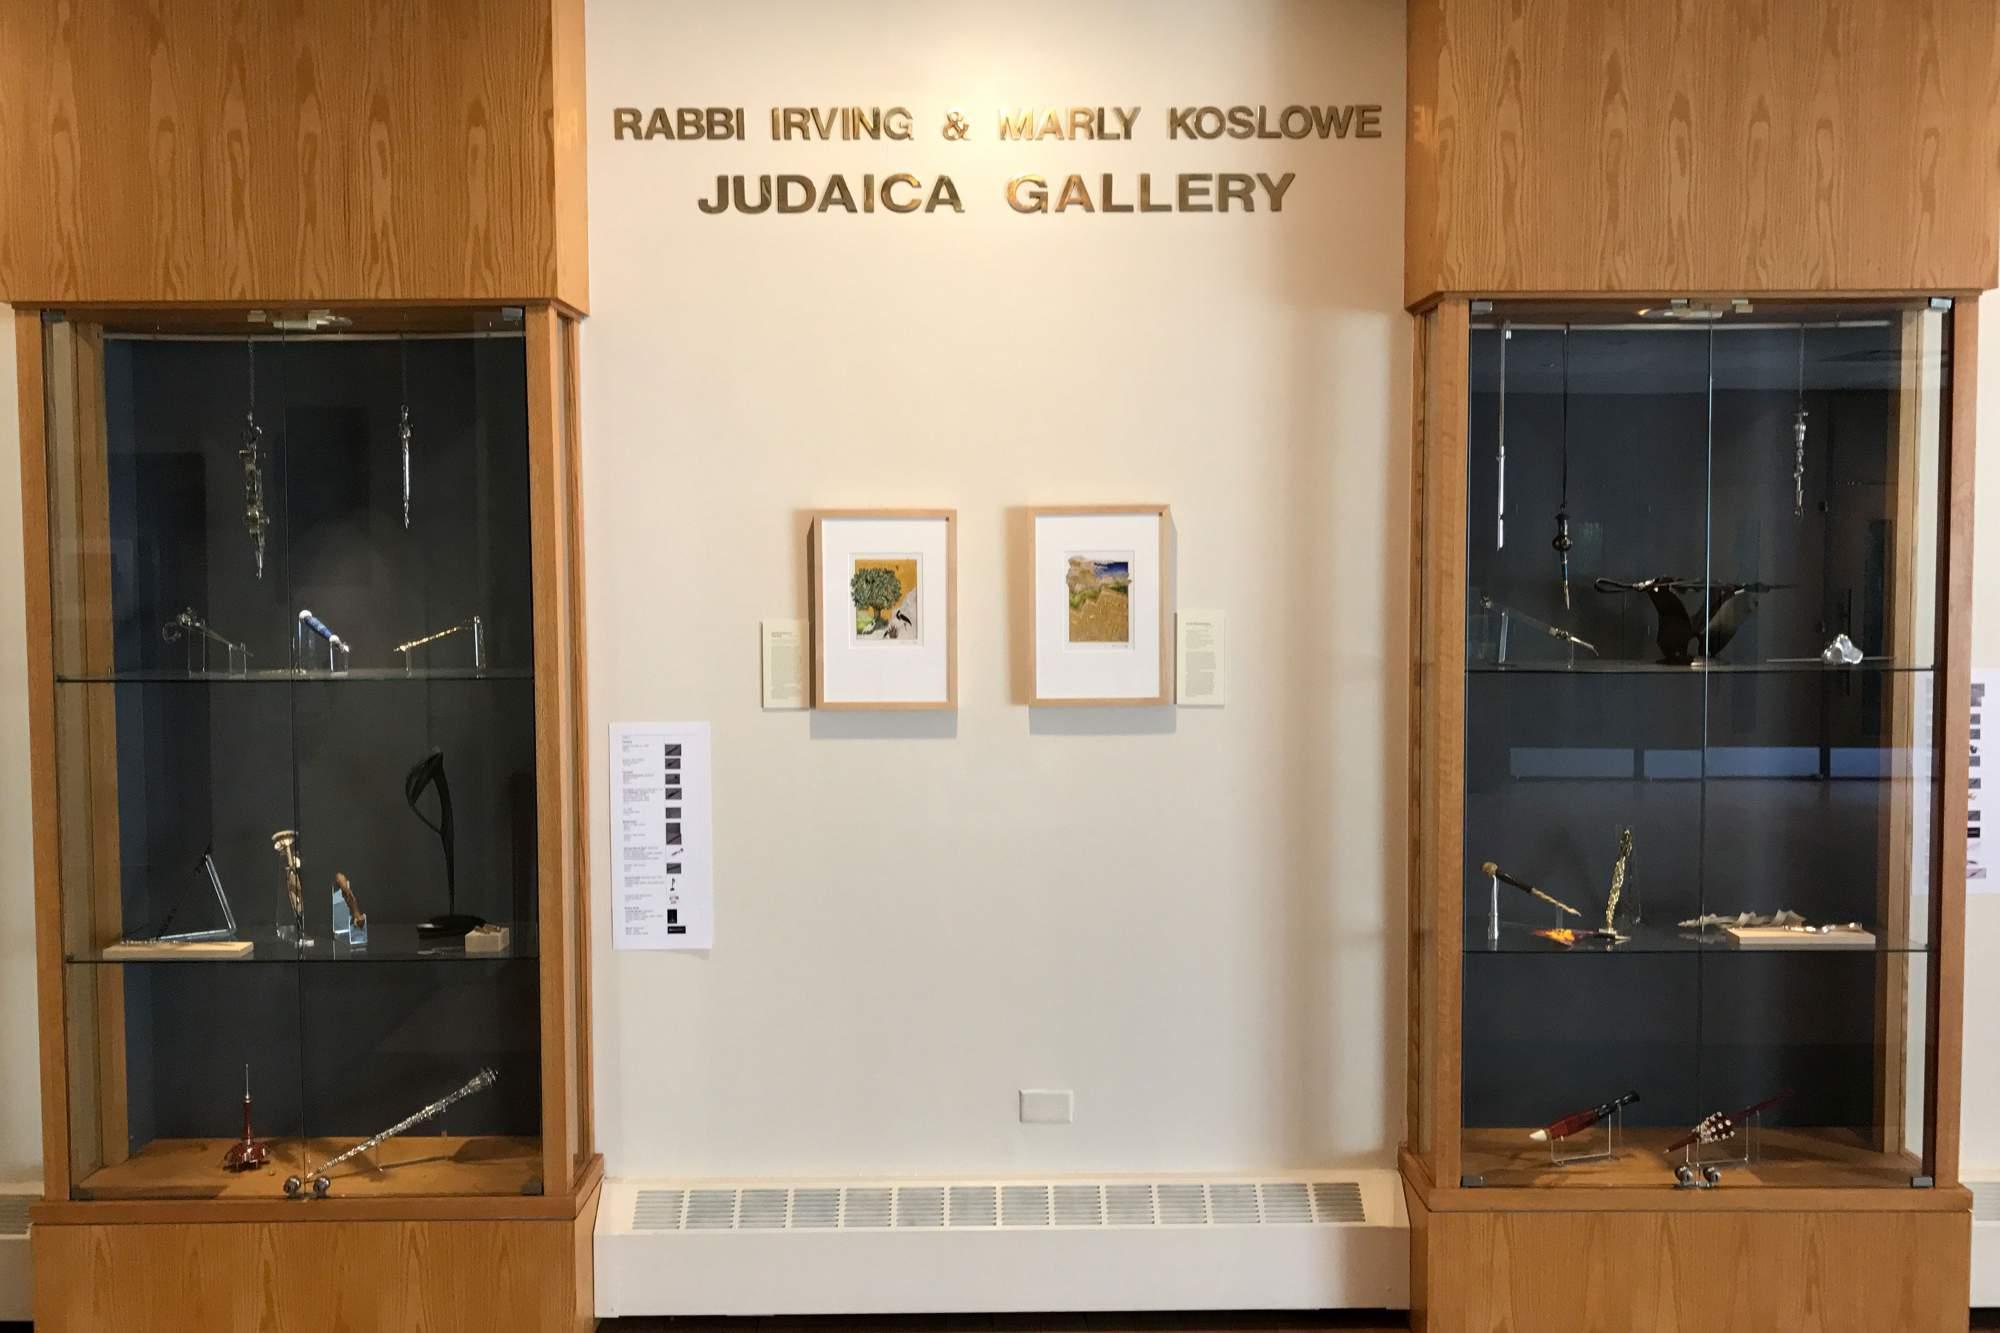 Rabbi Irving and Marly Koslowe Judaica Gallery